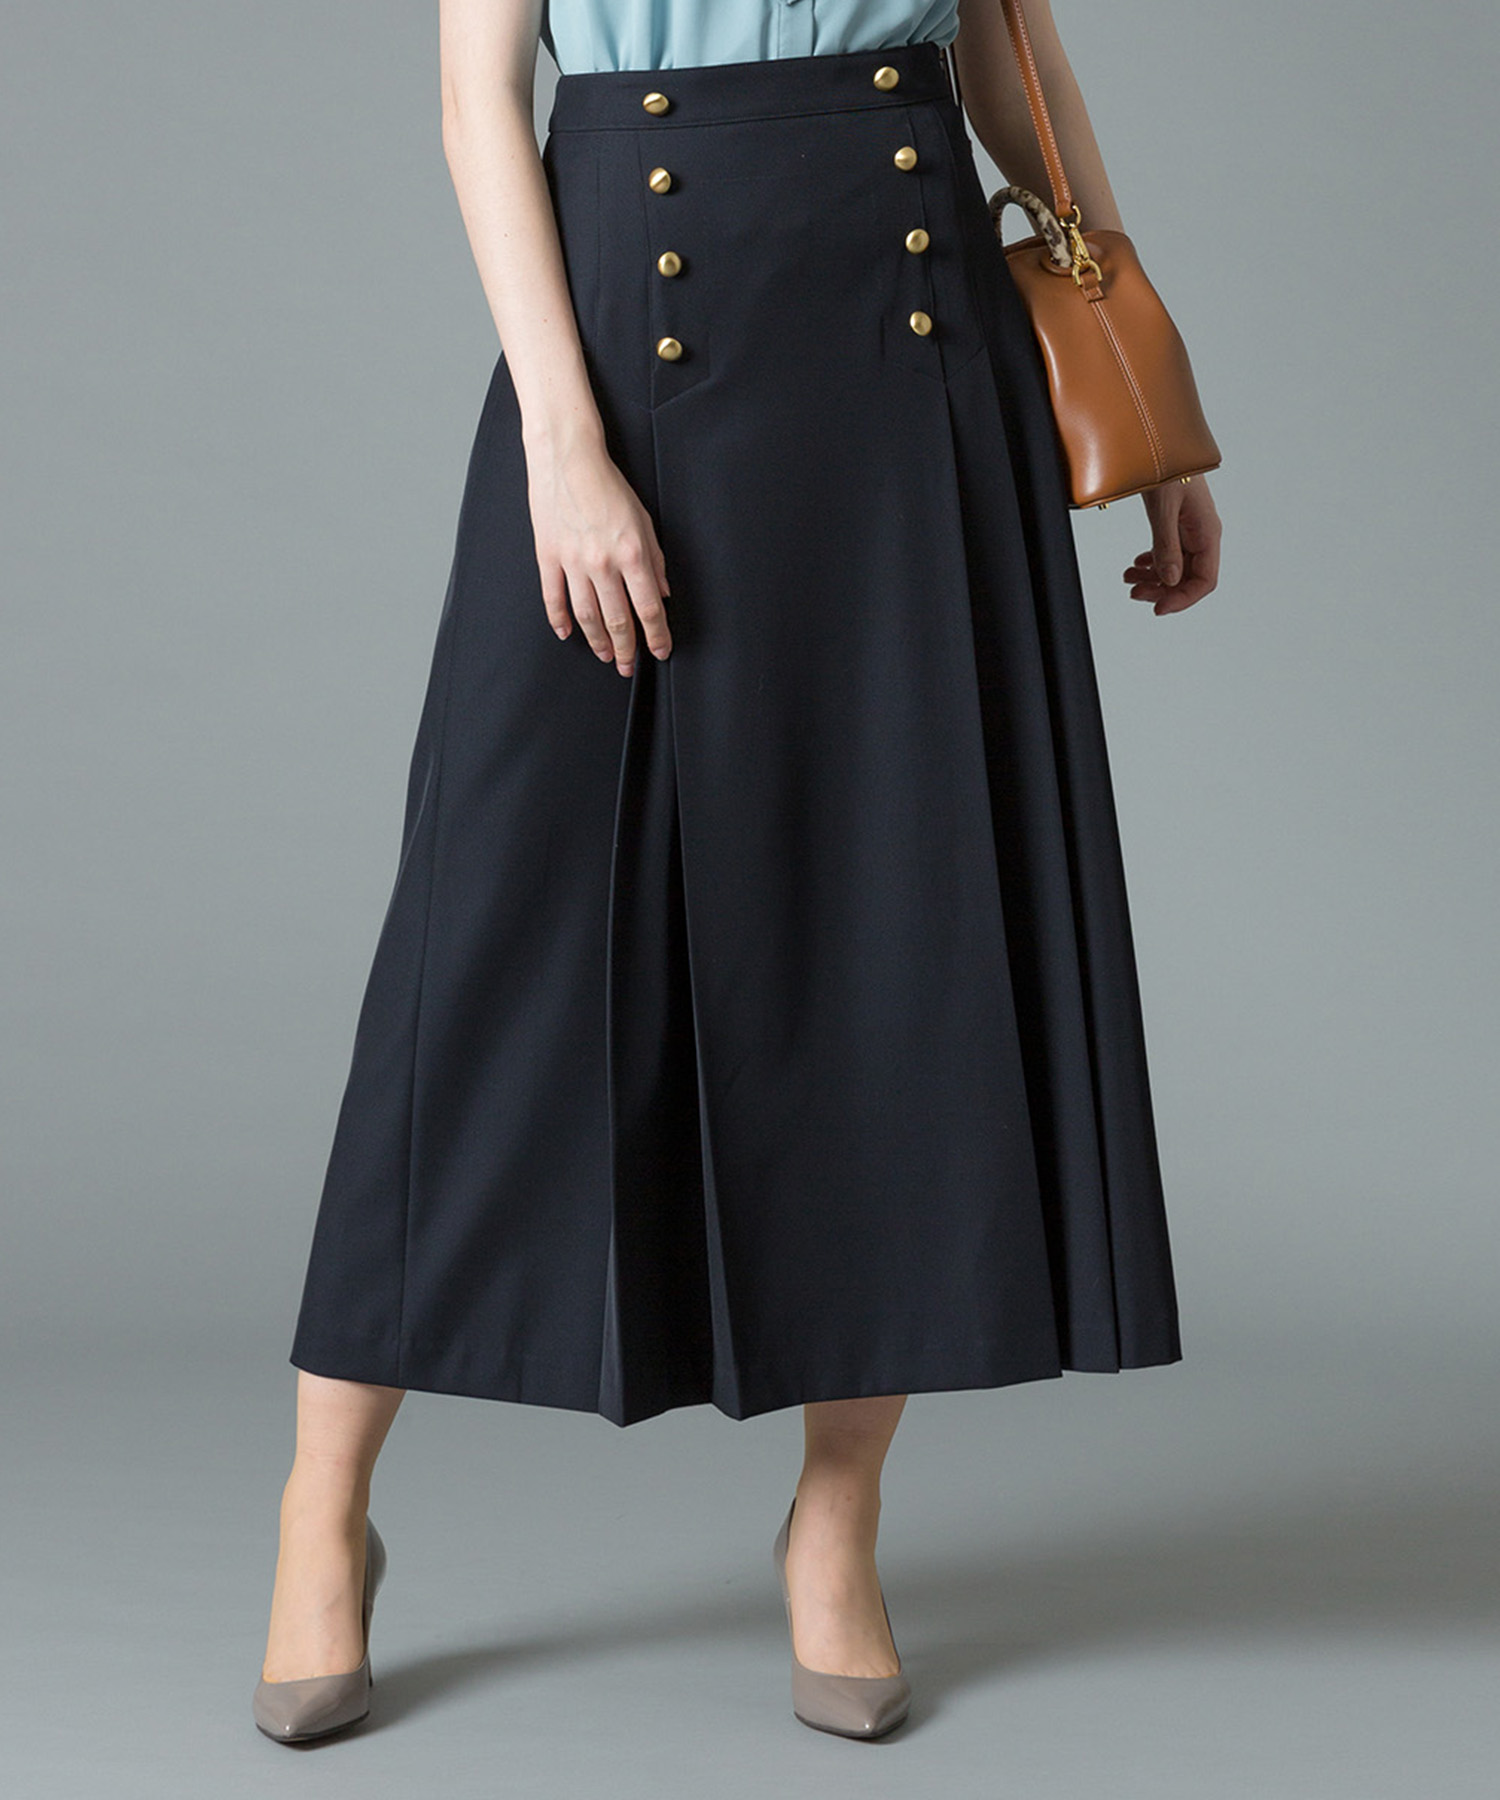 GD釦セーラーラップスカート